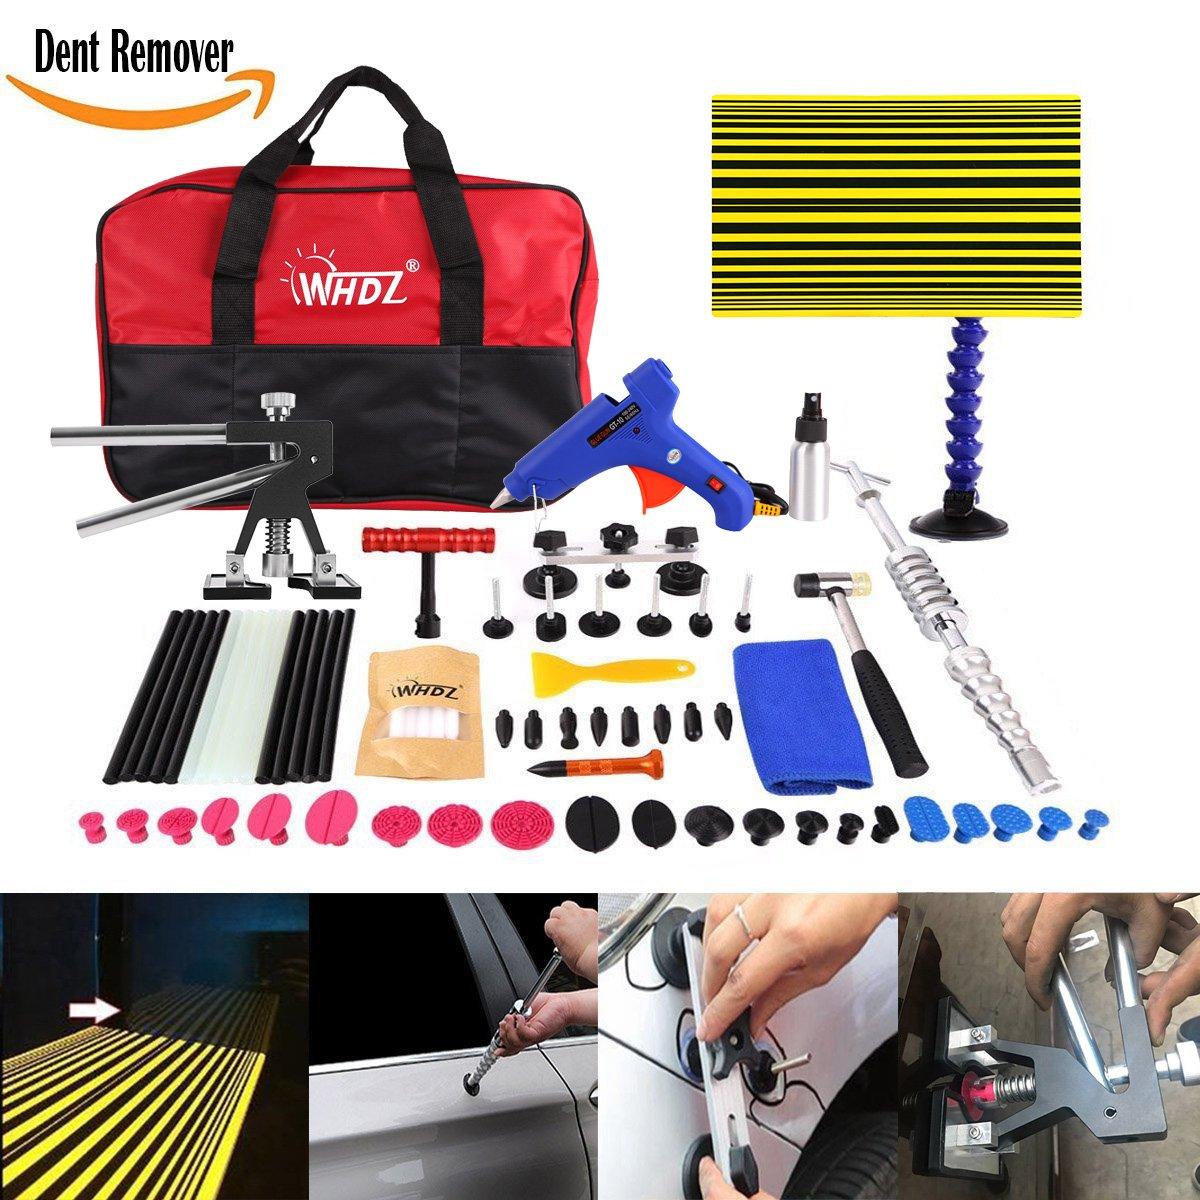 WHDZ 72Pcs Car Body Paintless Repair Removal Tools Automotive Door Ding Dent Silde Hammer Glue Puller Repair Starter Set Kits For Car Hail Damage And Door Dings Repair